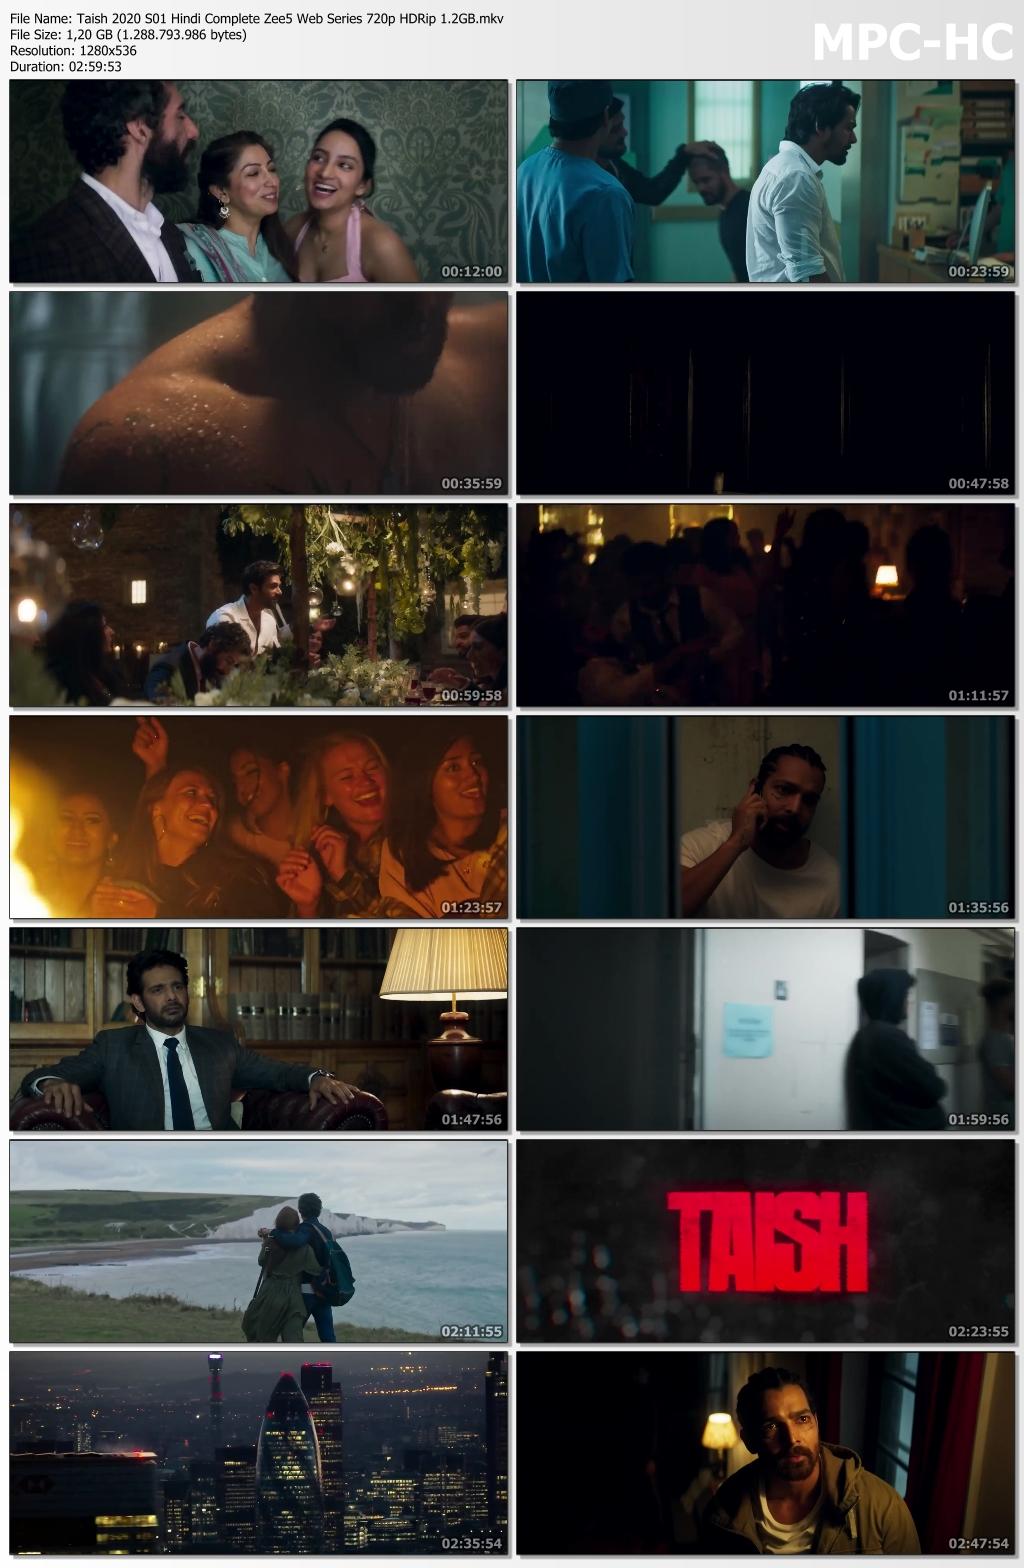 Taish-2020-S01-Hindi-Complete-Zee5-Web-Series-720p-HDRip-1-2-GB-mkv-thumbs